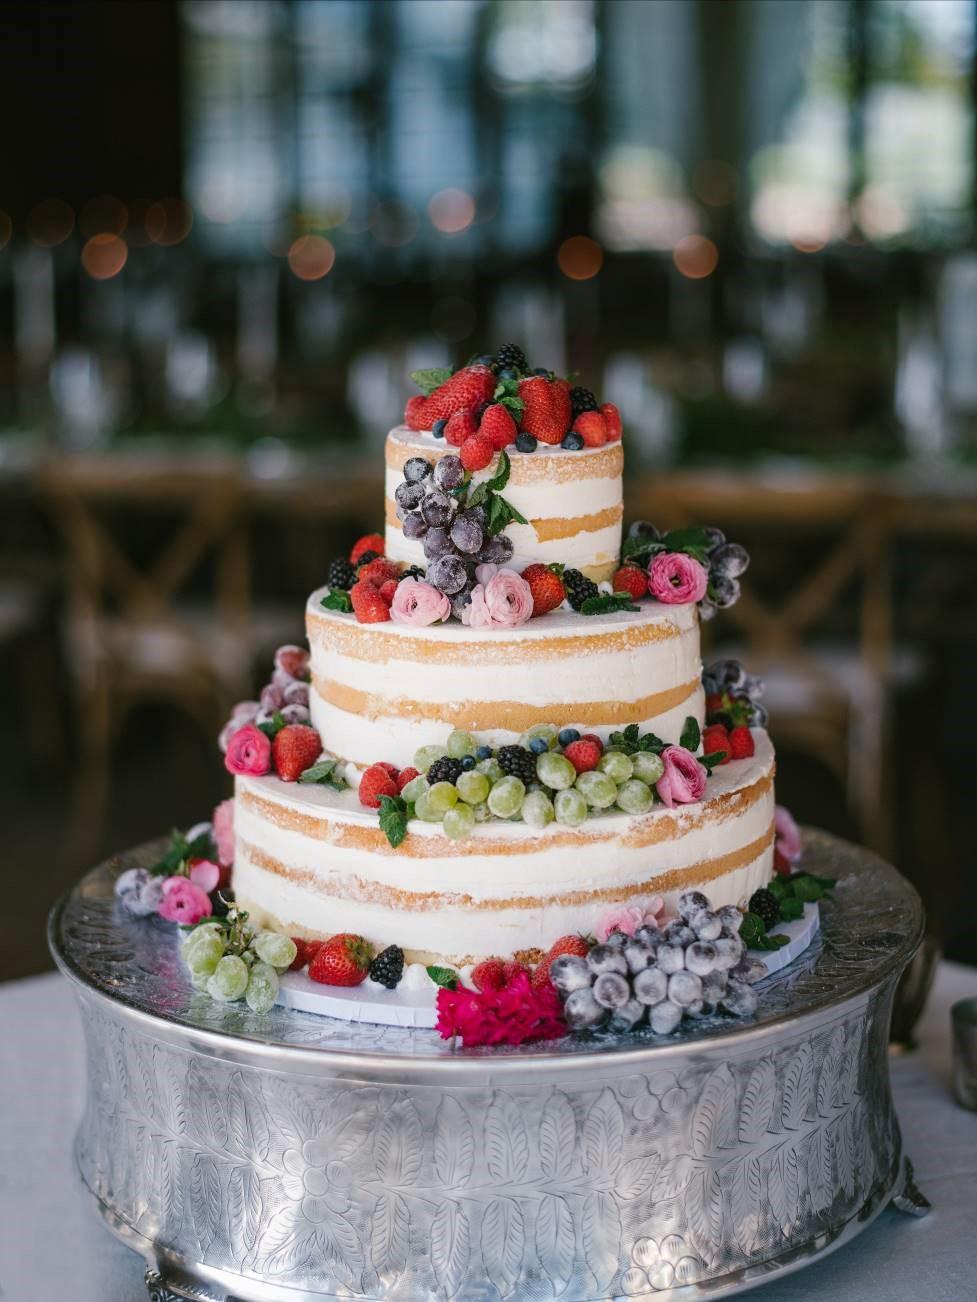 C_Weddings_EventoftheSeason_WeddingCake.jpg